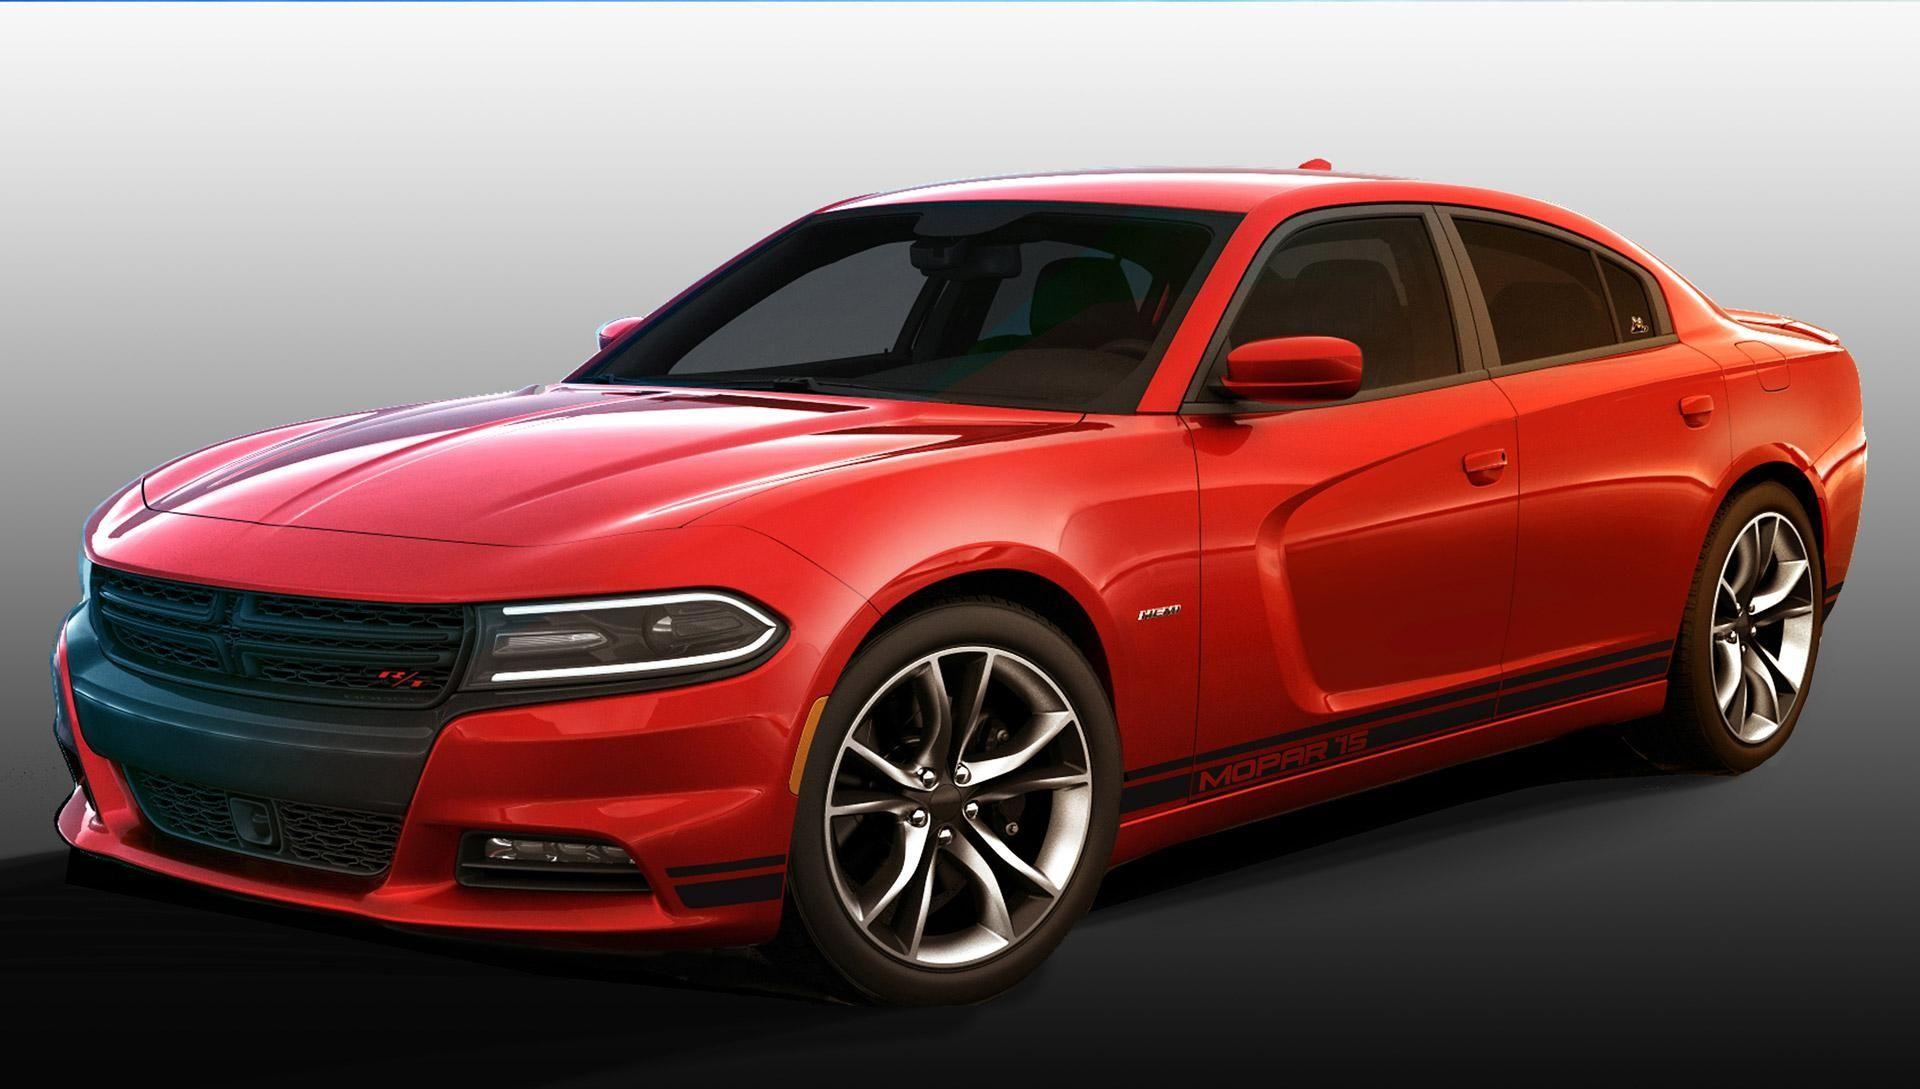 2017 Dodge Charger Msrp >> 2019 Dodge Charger Msrp Price Interior Mpg Automigas